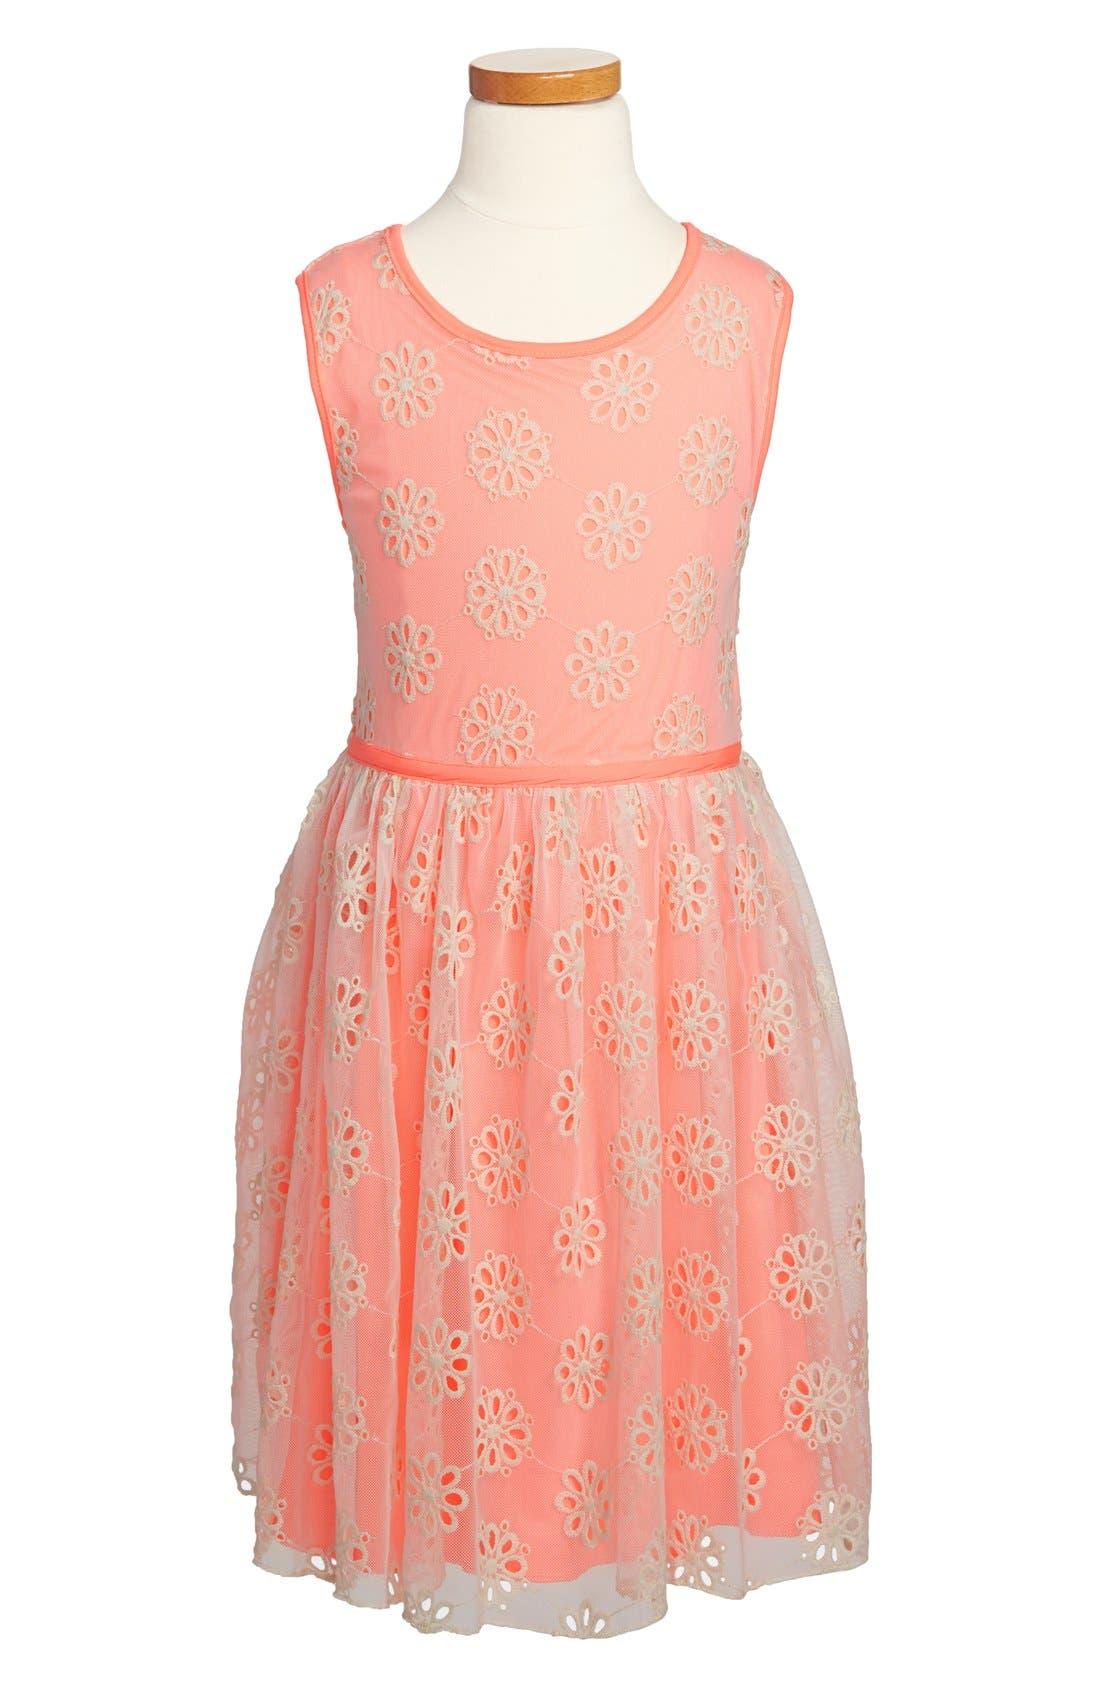 Alternate Image 1 Selected - Zunie Embroidered Sleeveless Dress (Little Girls & Big Girls)